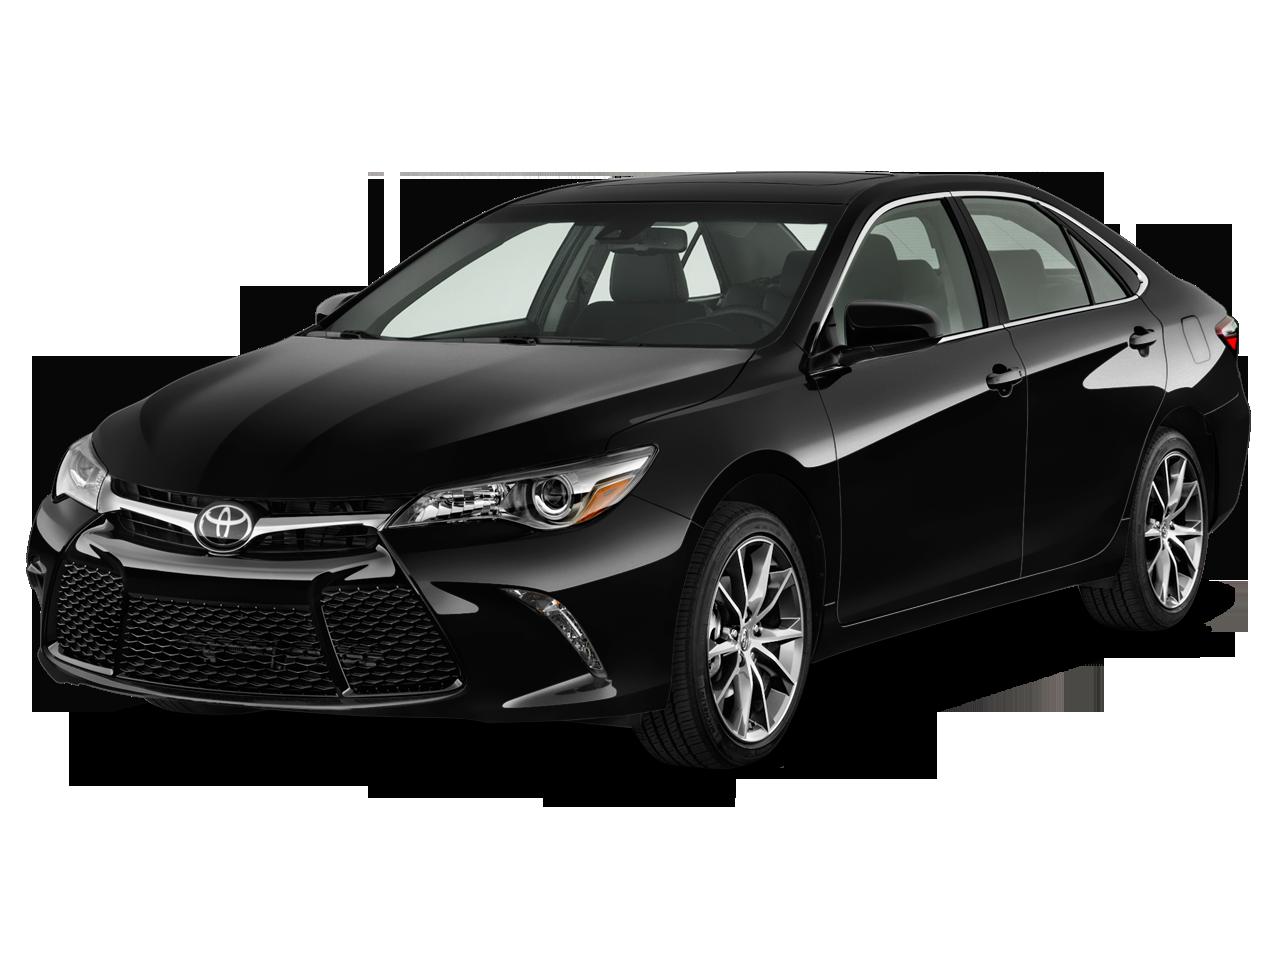 2017-toyota-camry-se-sedan-angular-front-midnight-black-metallic.png